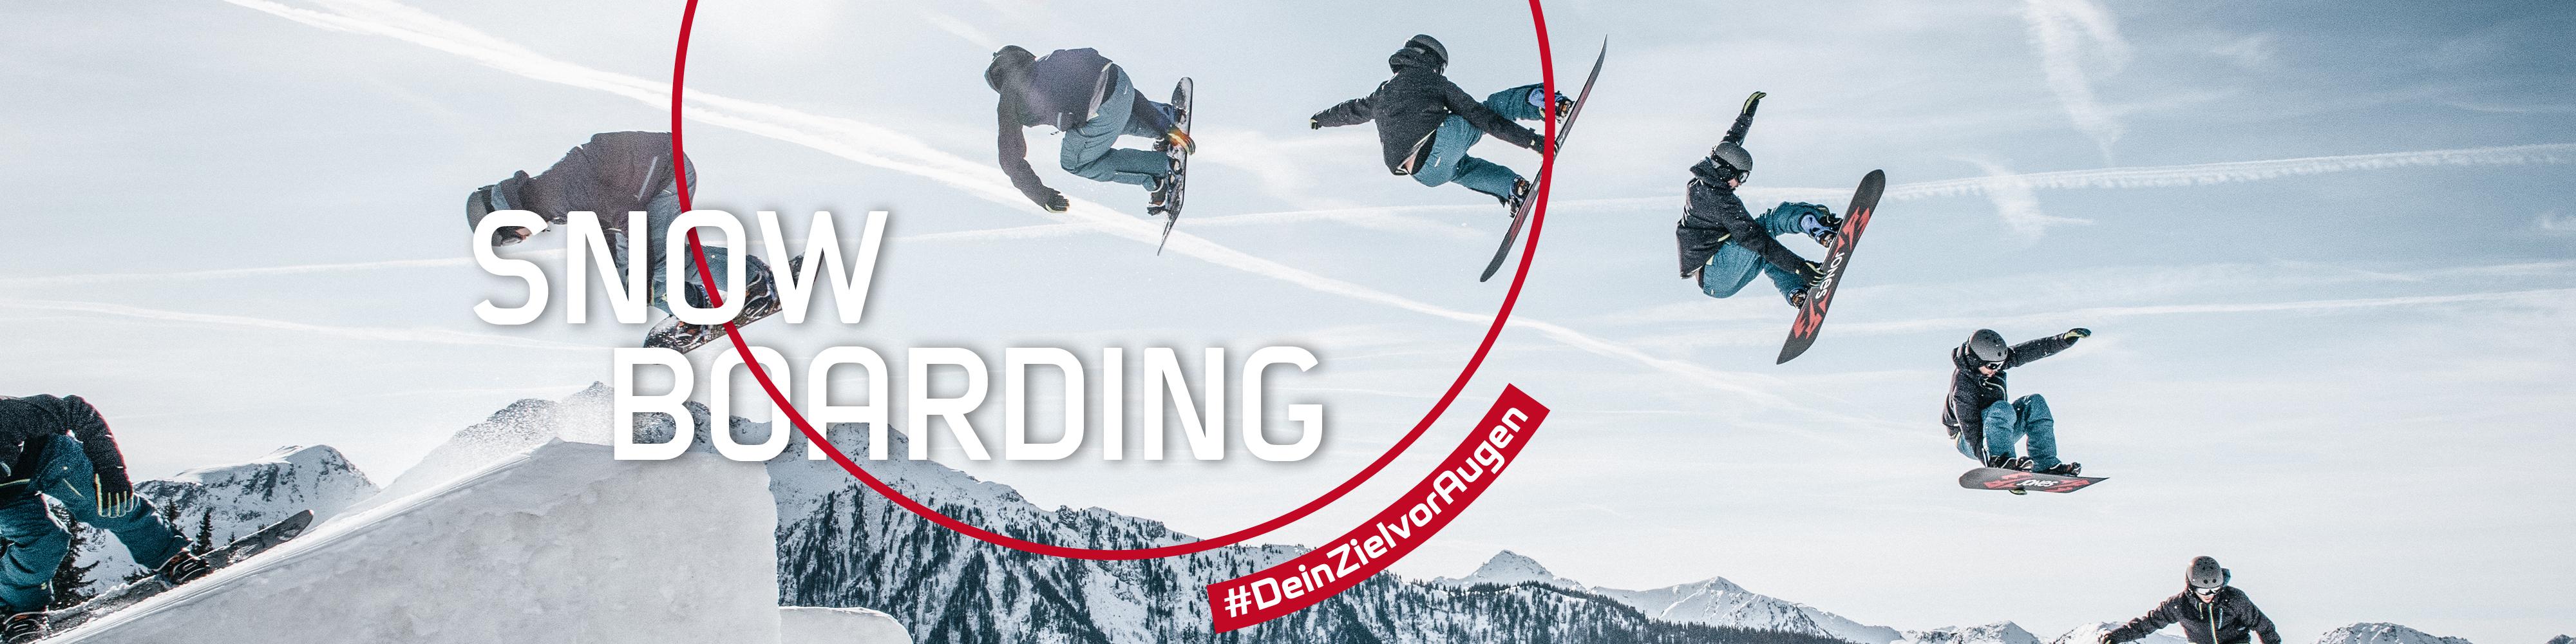 Snowboarding-Kategorie